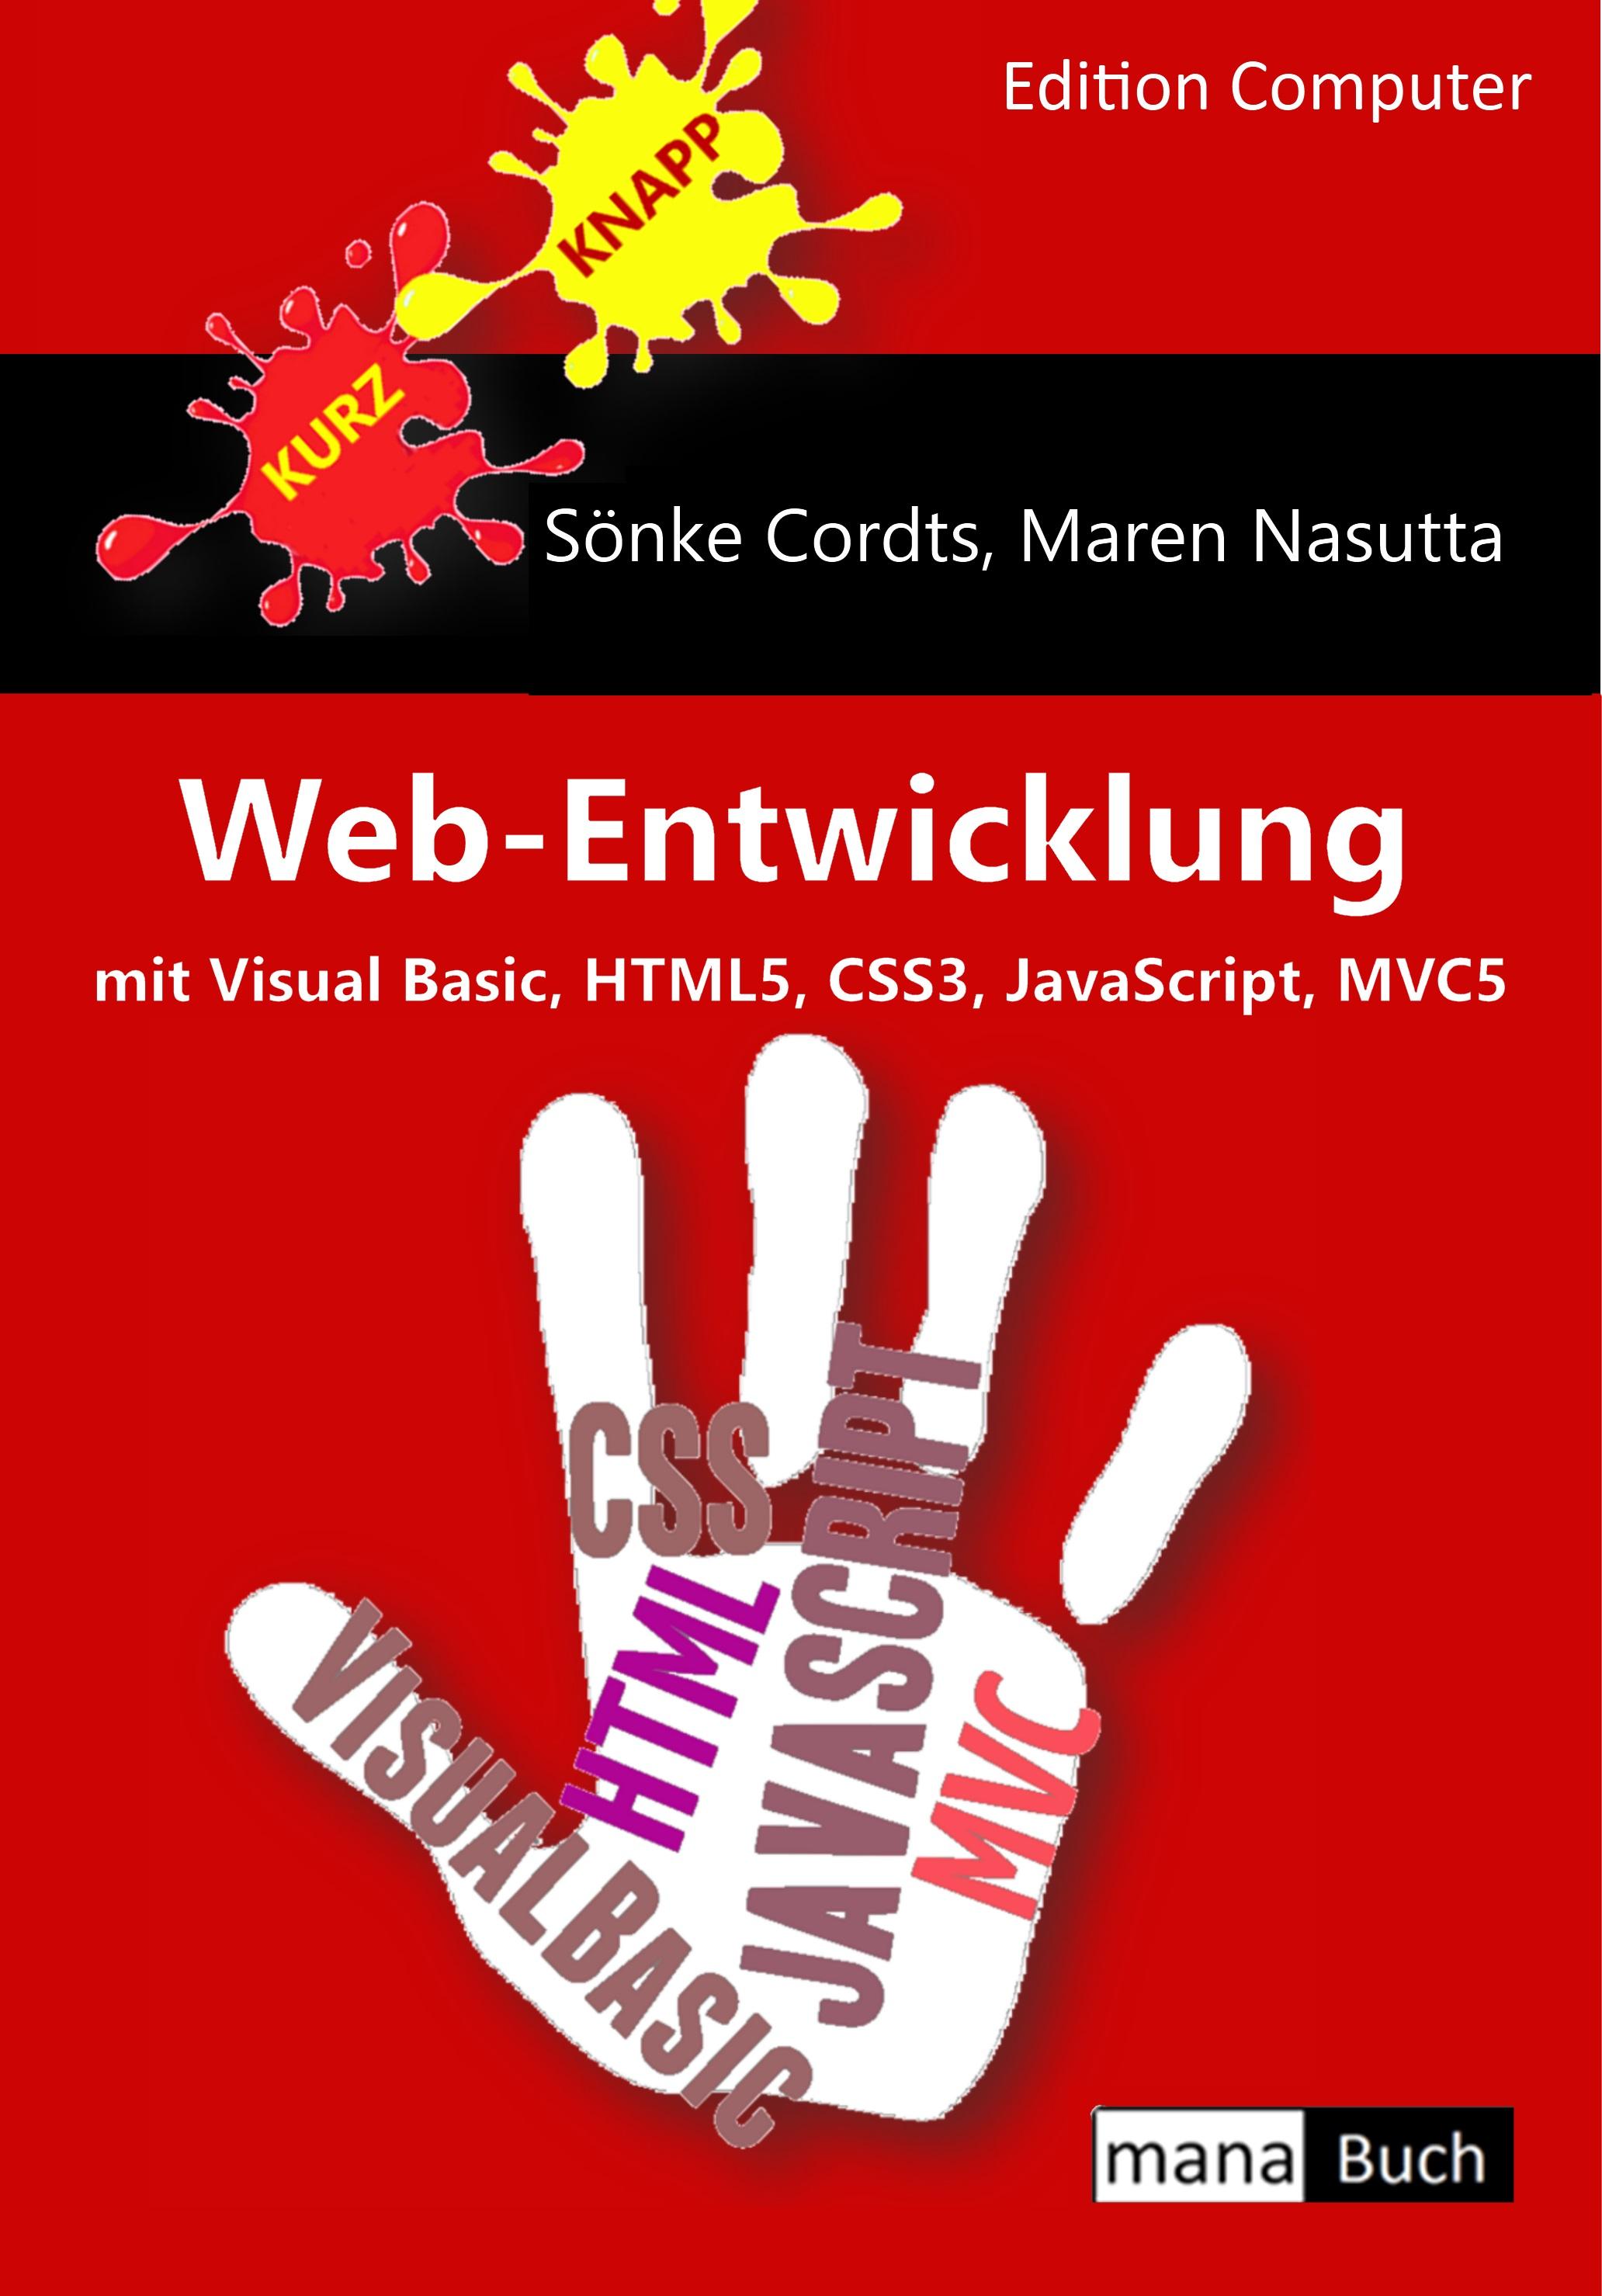 Web-Entwicklung mit Visual Basic, HTML5, CSS3, JavaScript und MVC5